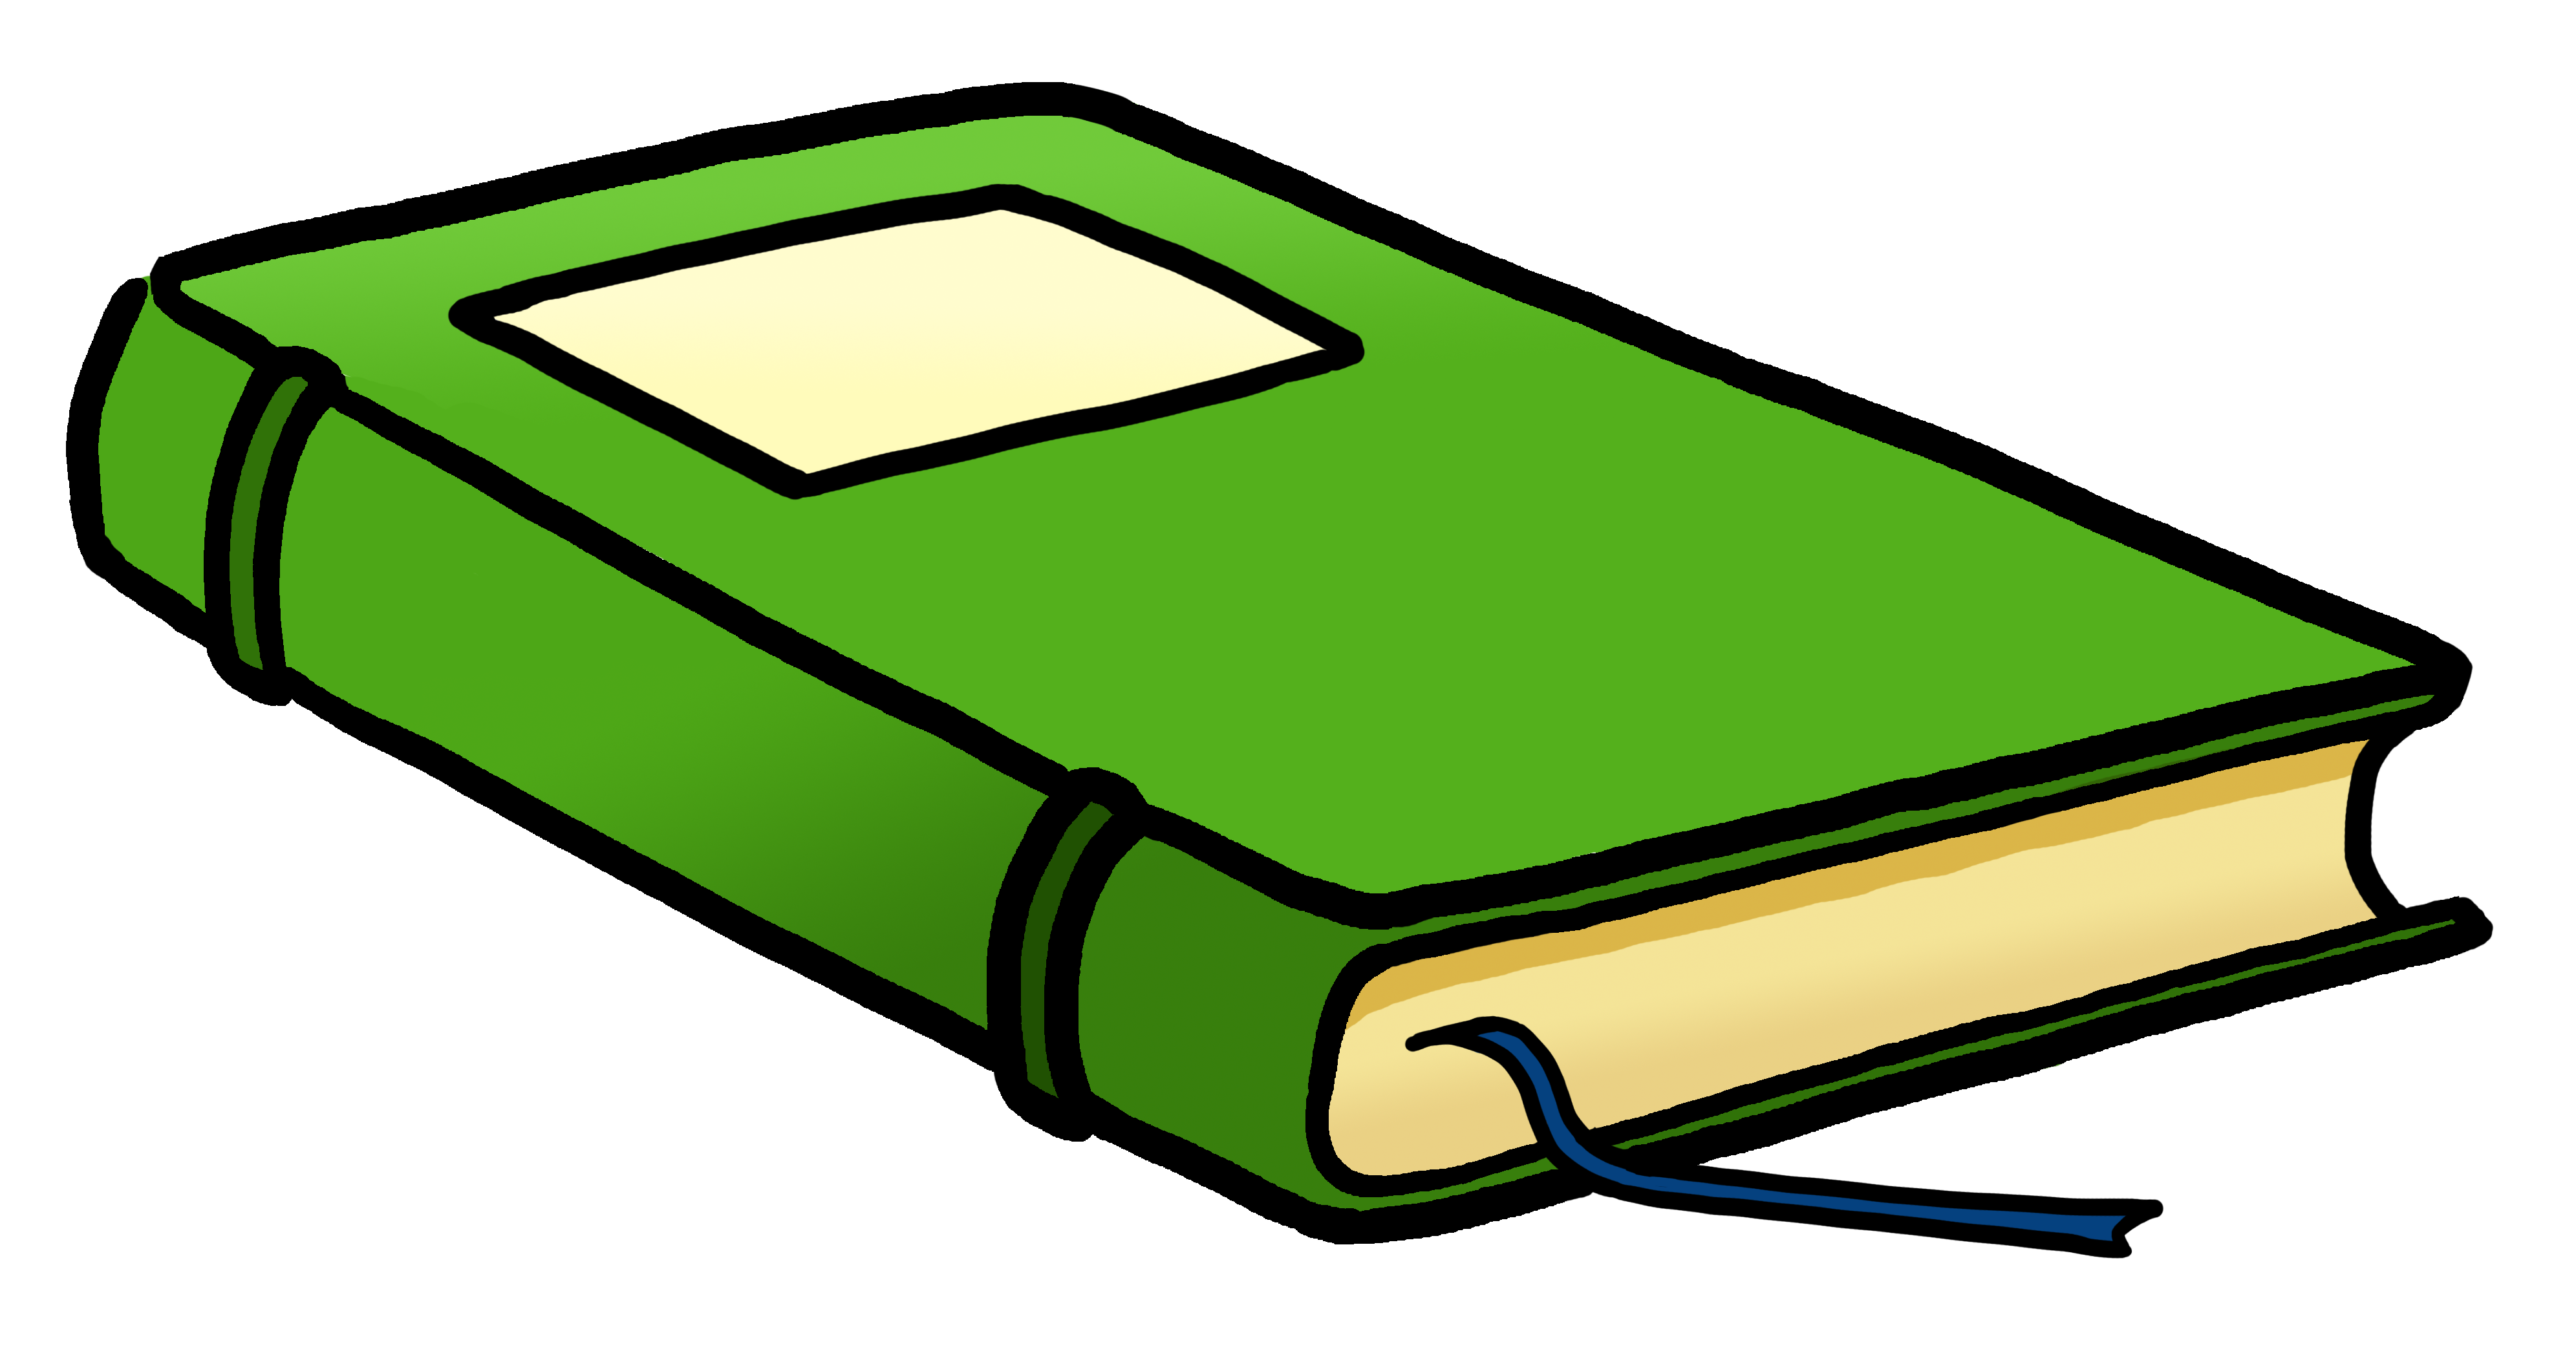 Book Clip Art - Book Clip